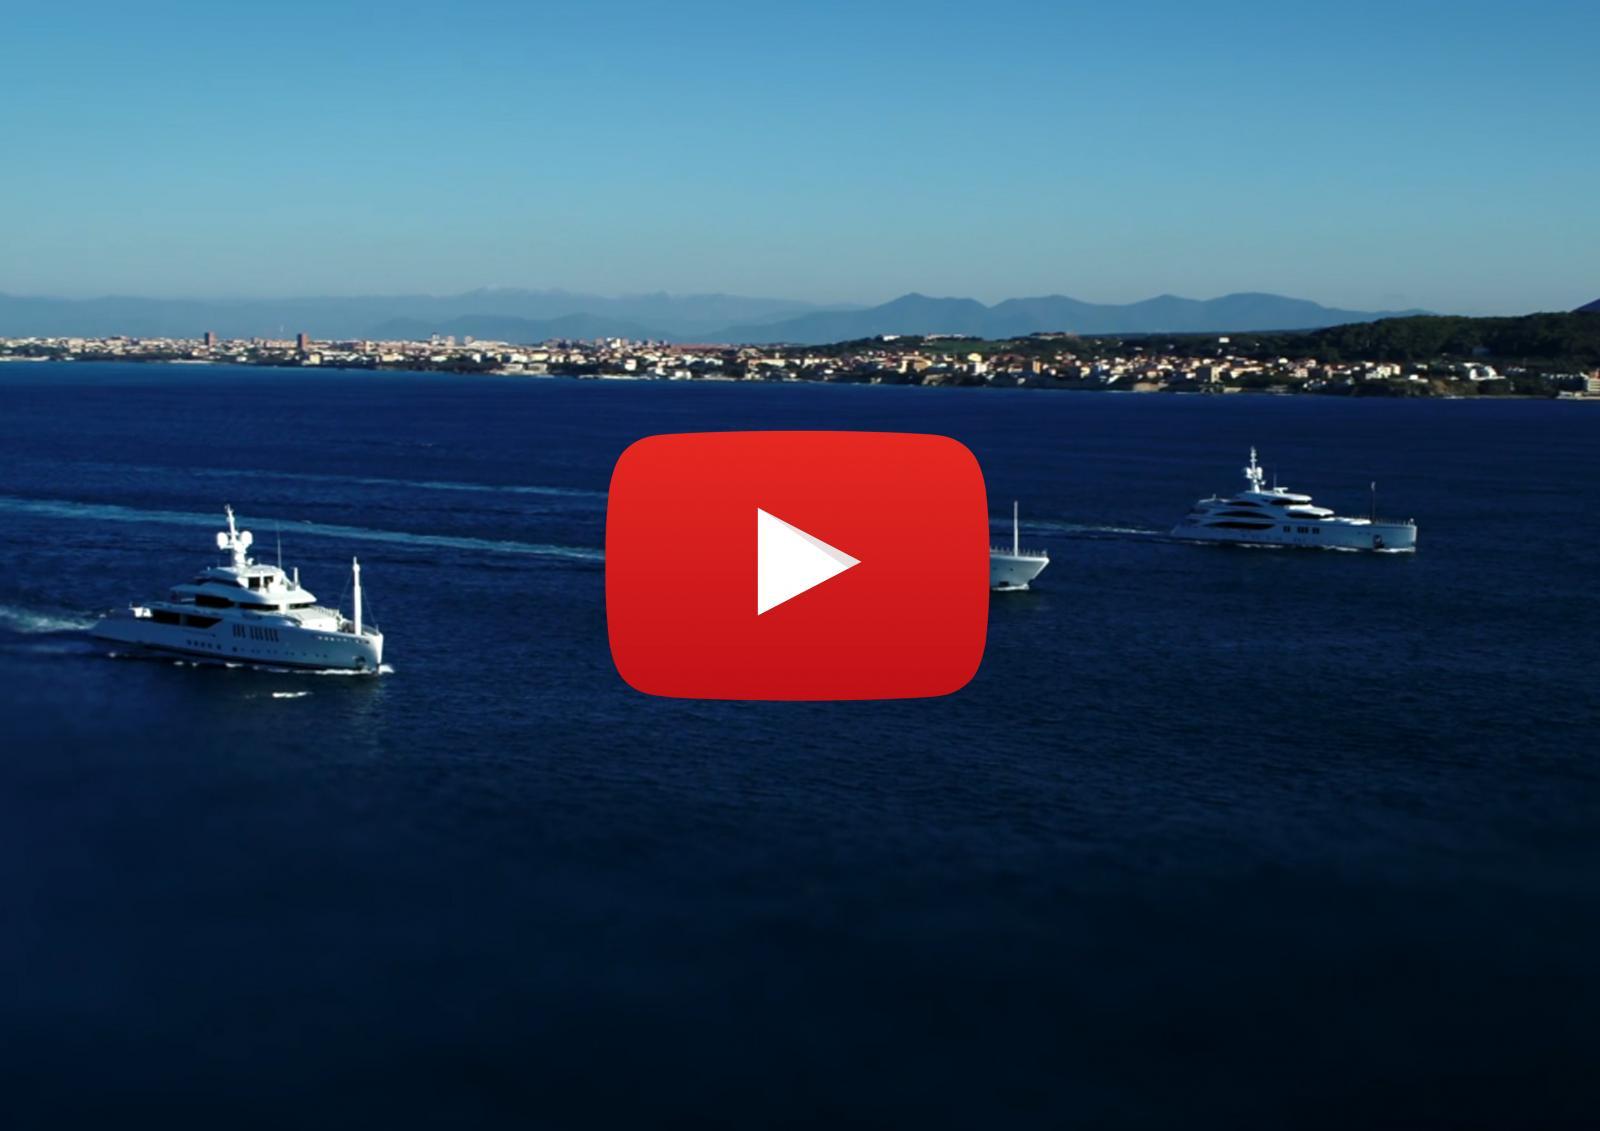 Benetti 3 Megayachts